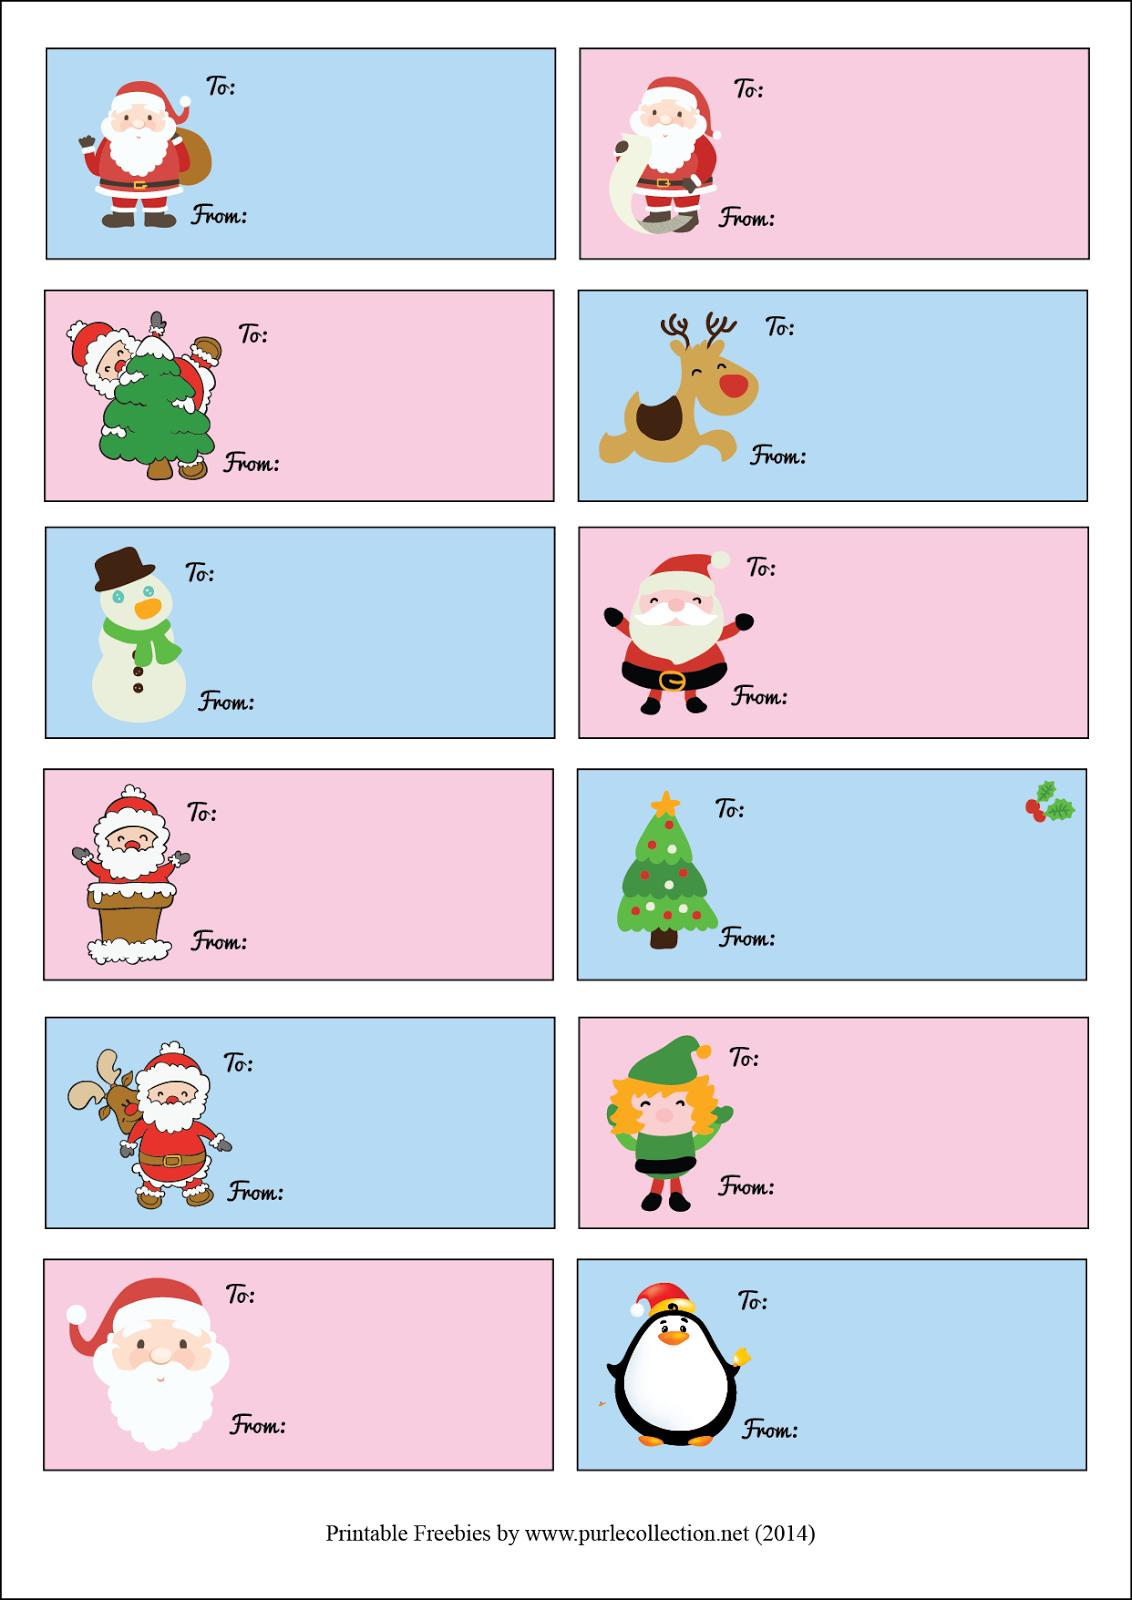 printable christmas tags, stickers, 2014, santa claus, cute, penguin, reindeer, tree, pink, light blue, snowflake, freebies